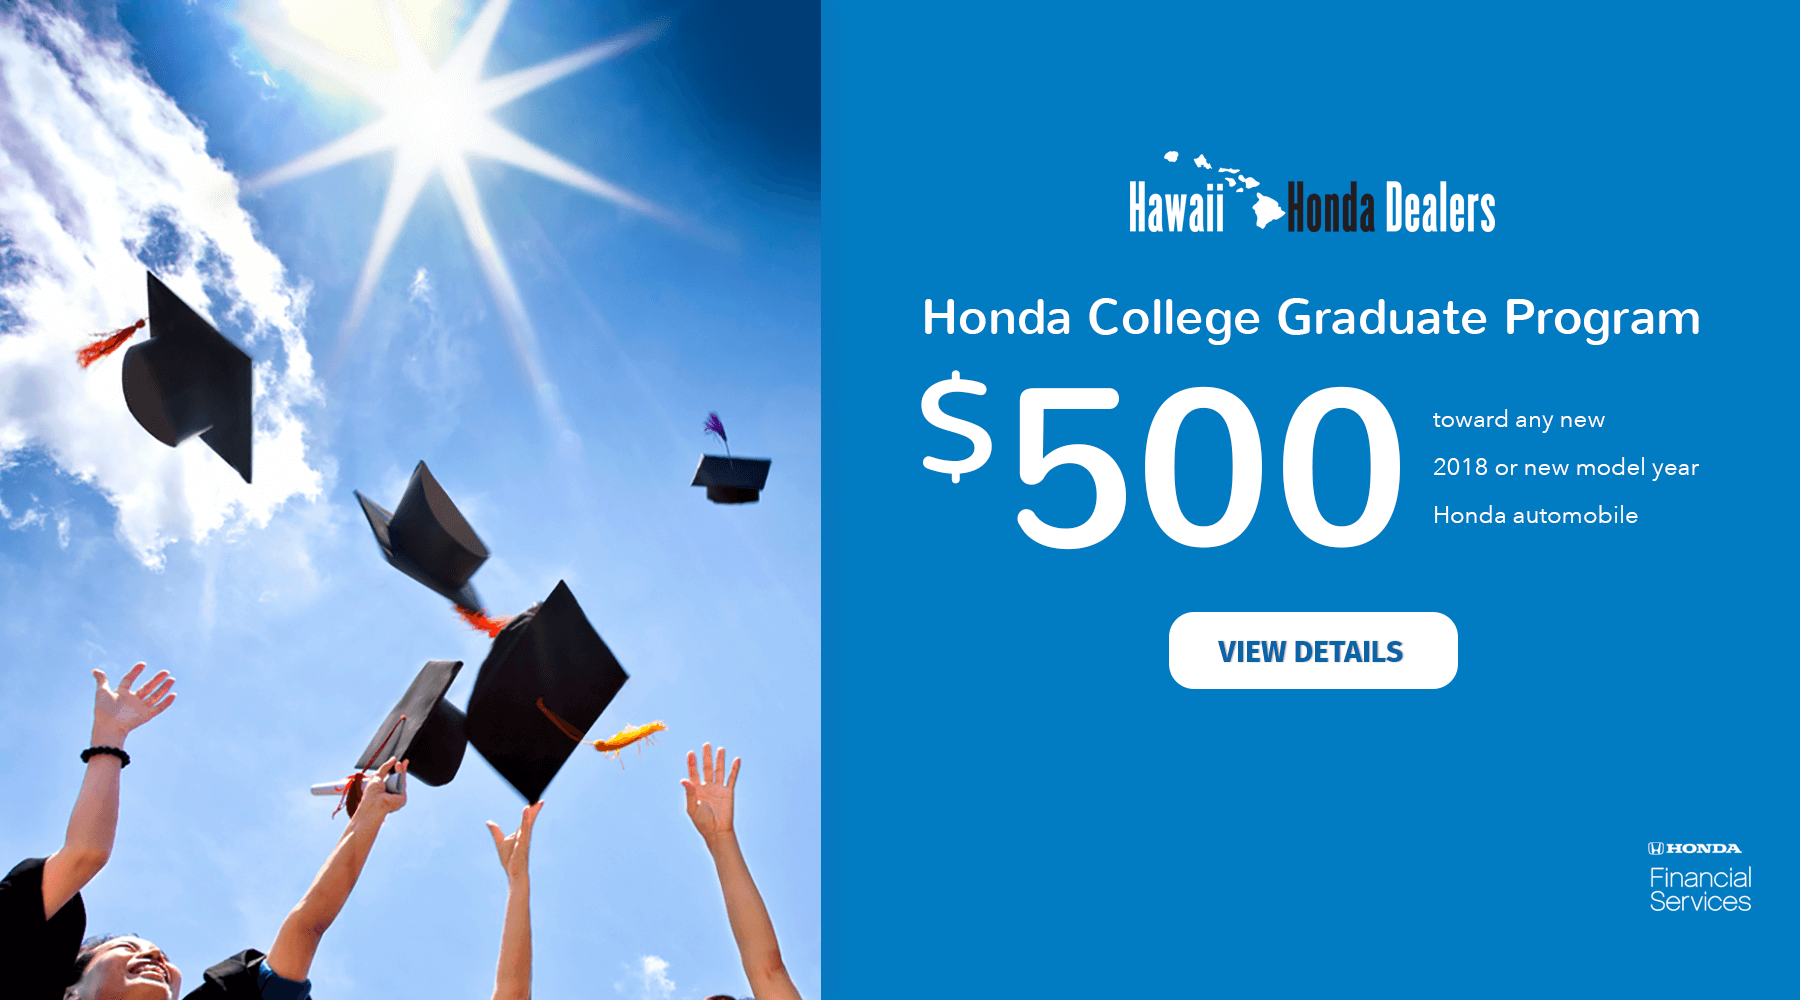 Honda College Graduate Program Hawaii Honda Dealers HP Slide